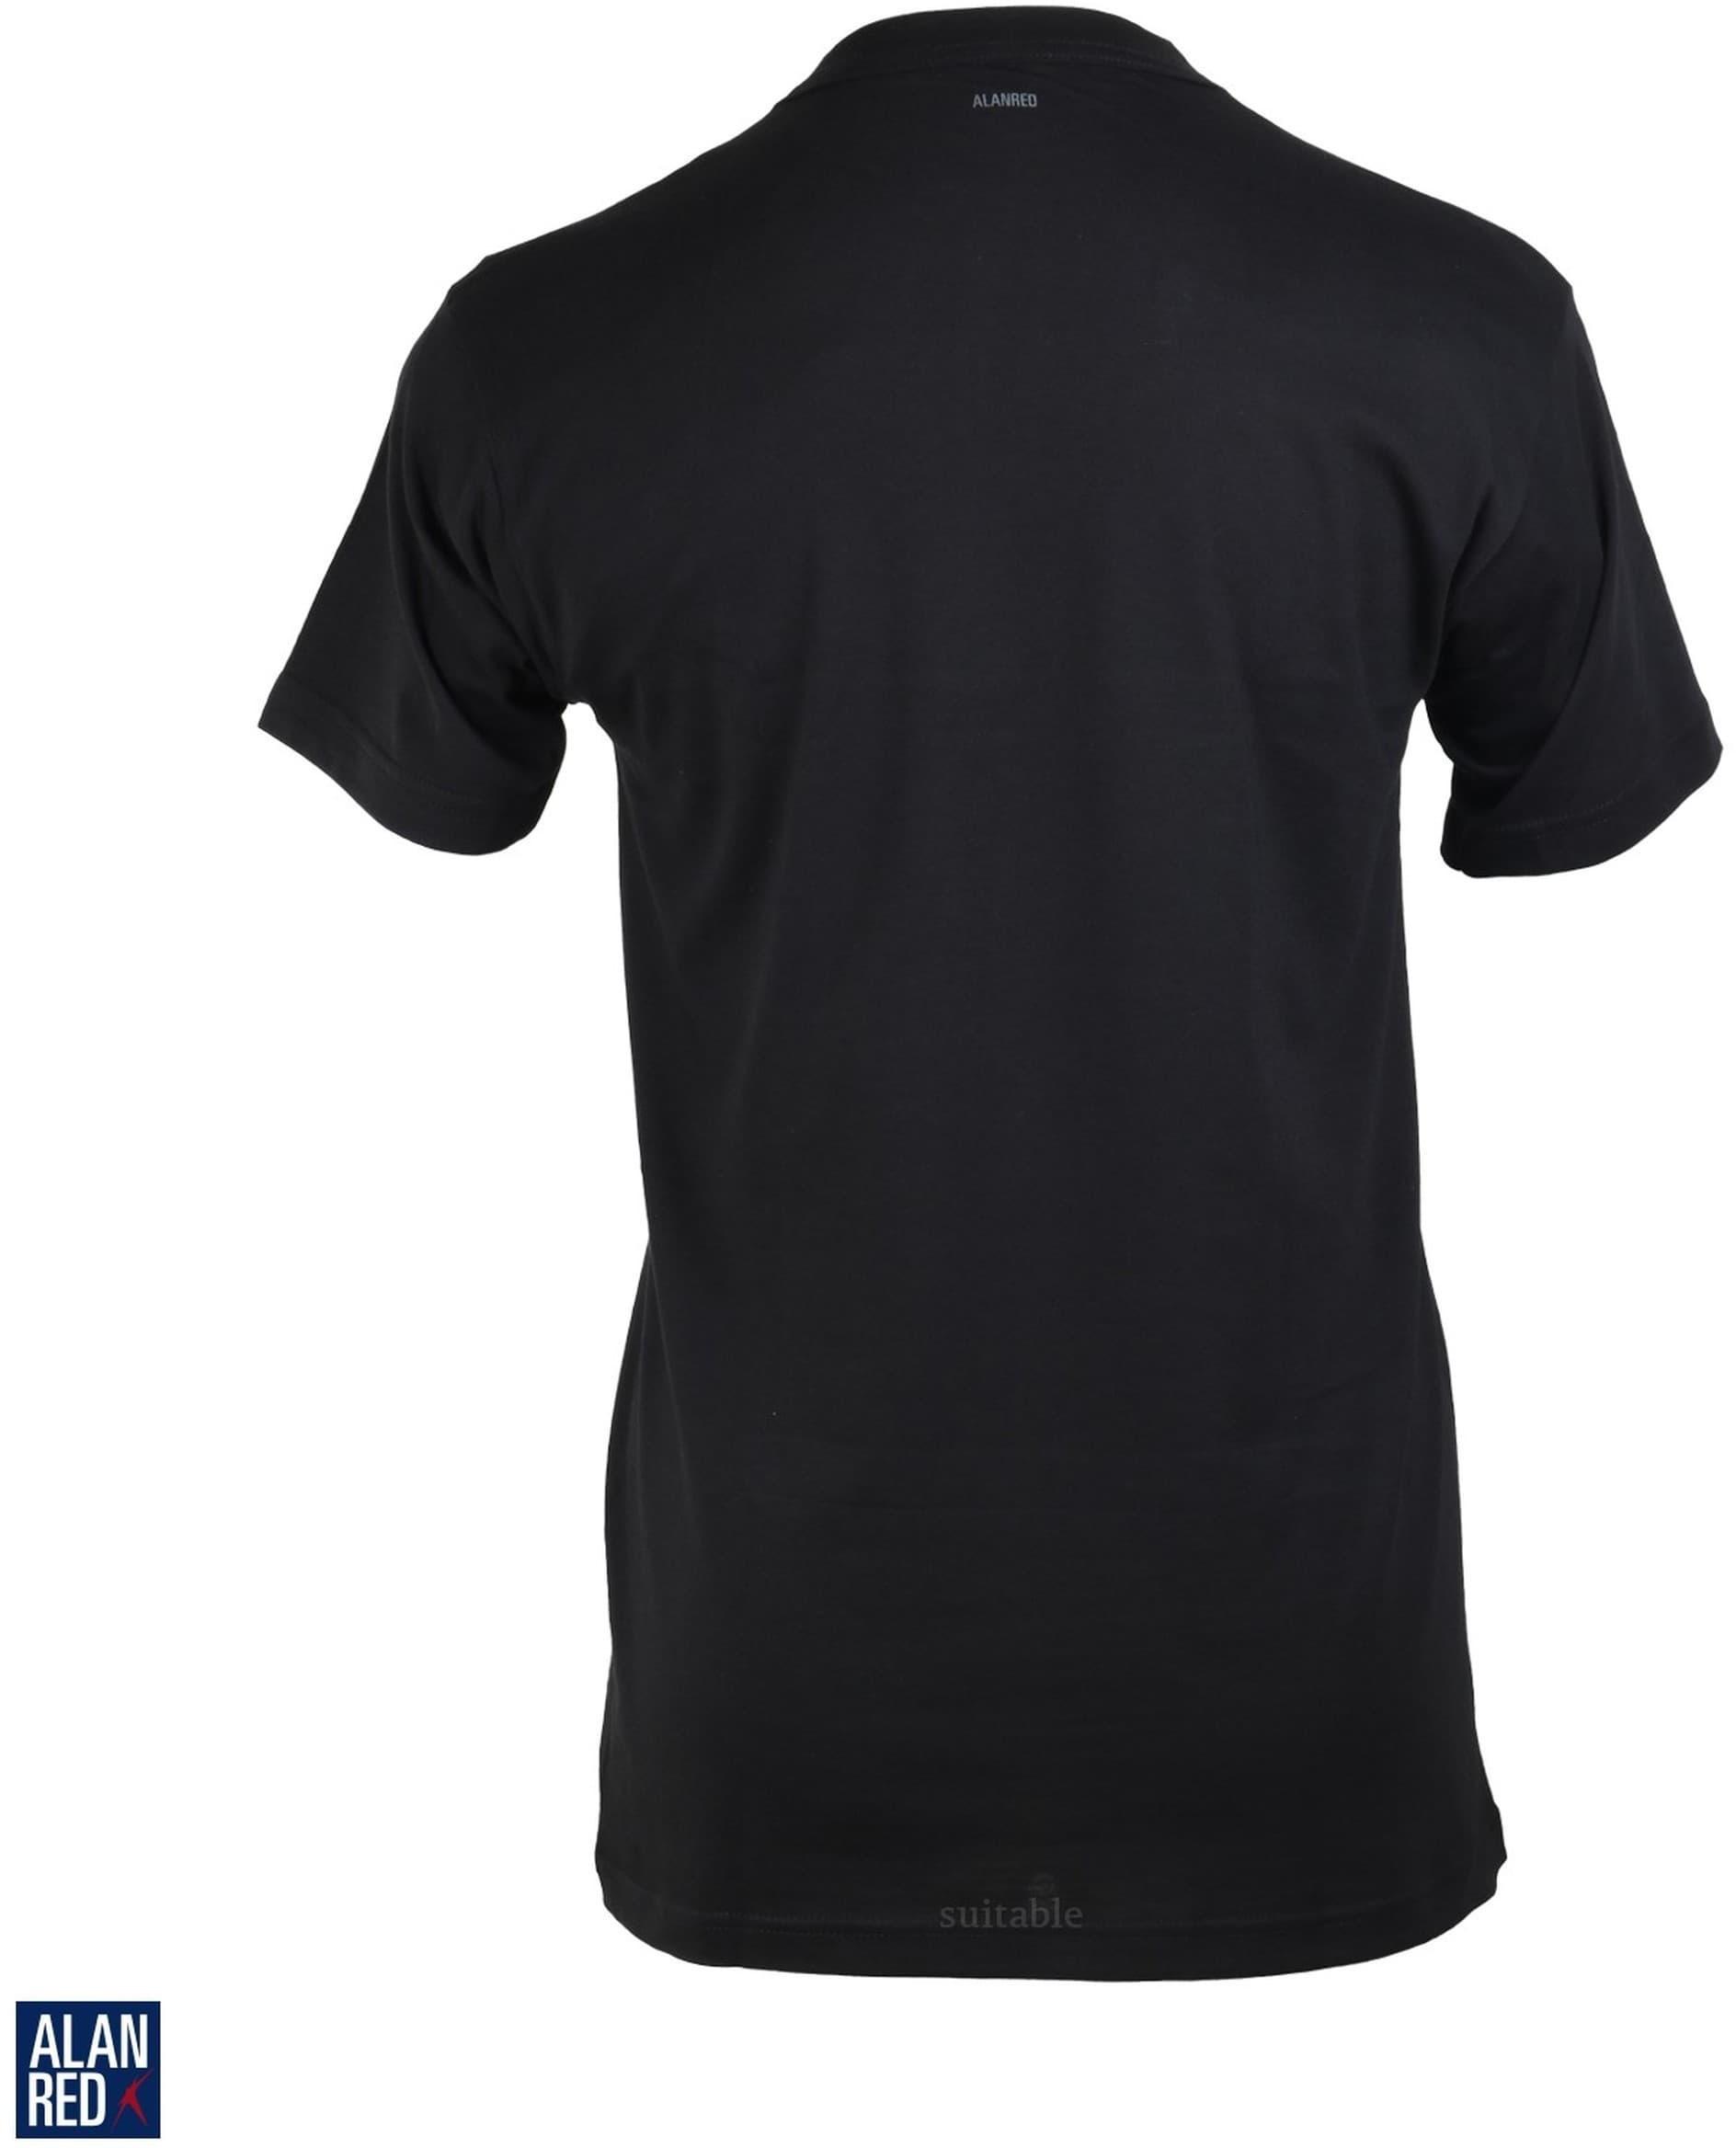 Alan Red T-shirt Virginia Black 1-Pack foto 2